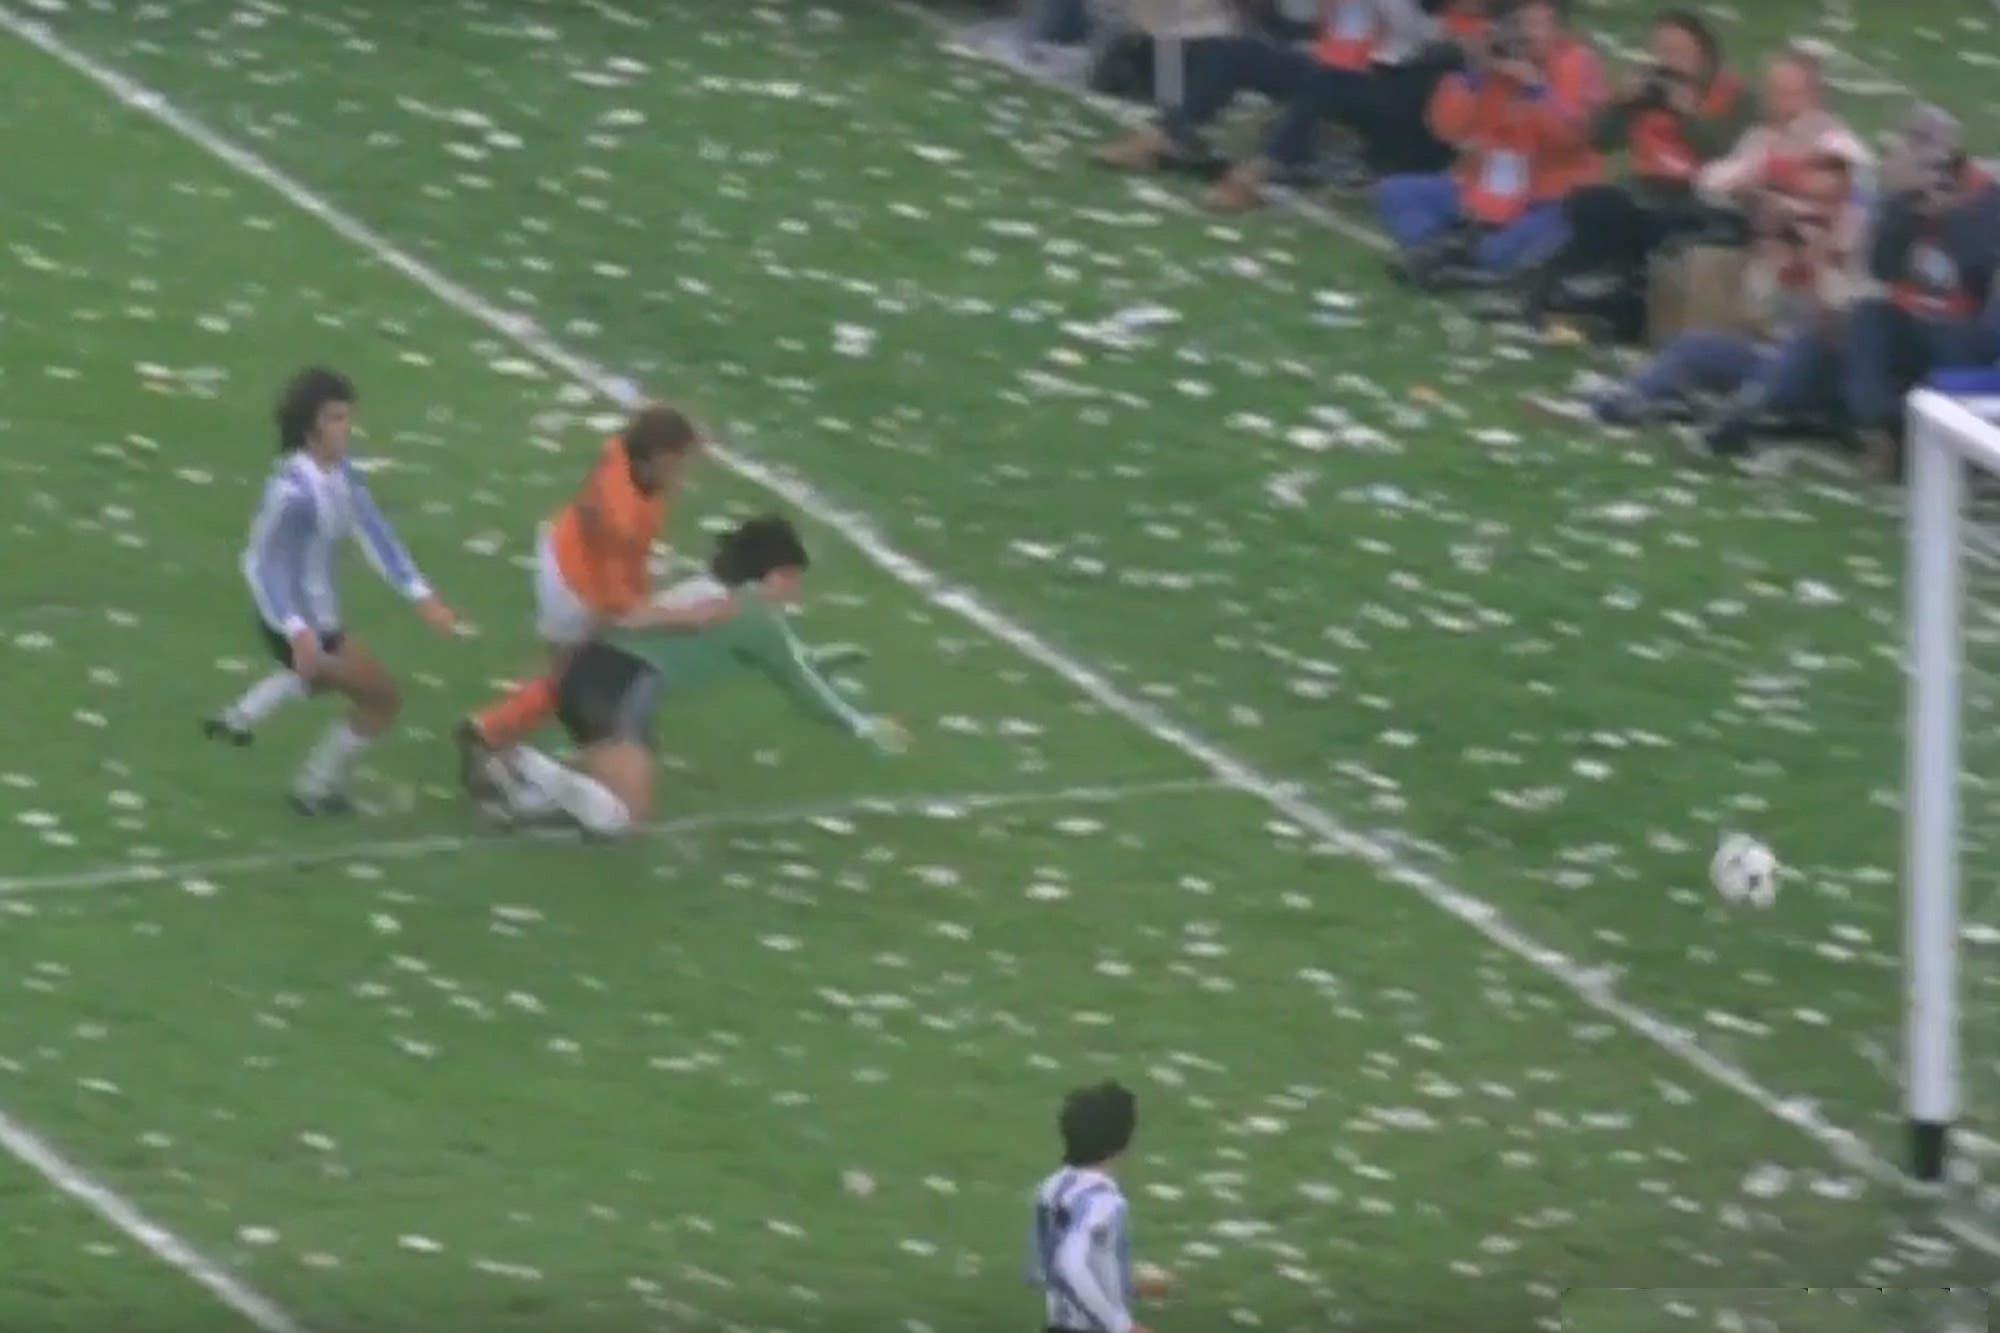 Murió Rensenbrink, el holandés del tiro en el palo en la final del Mundial 78